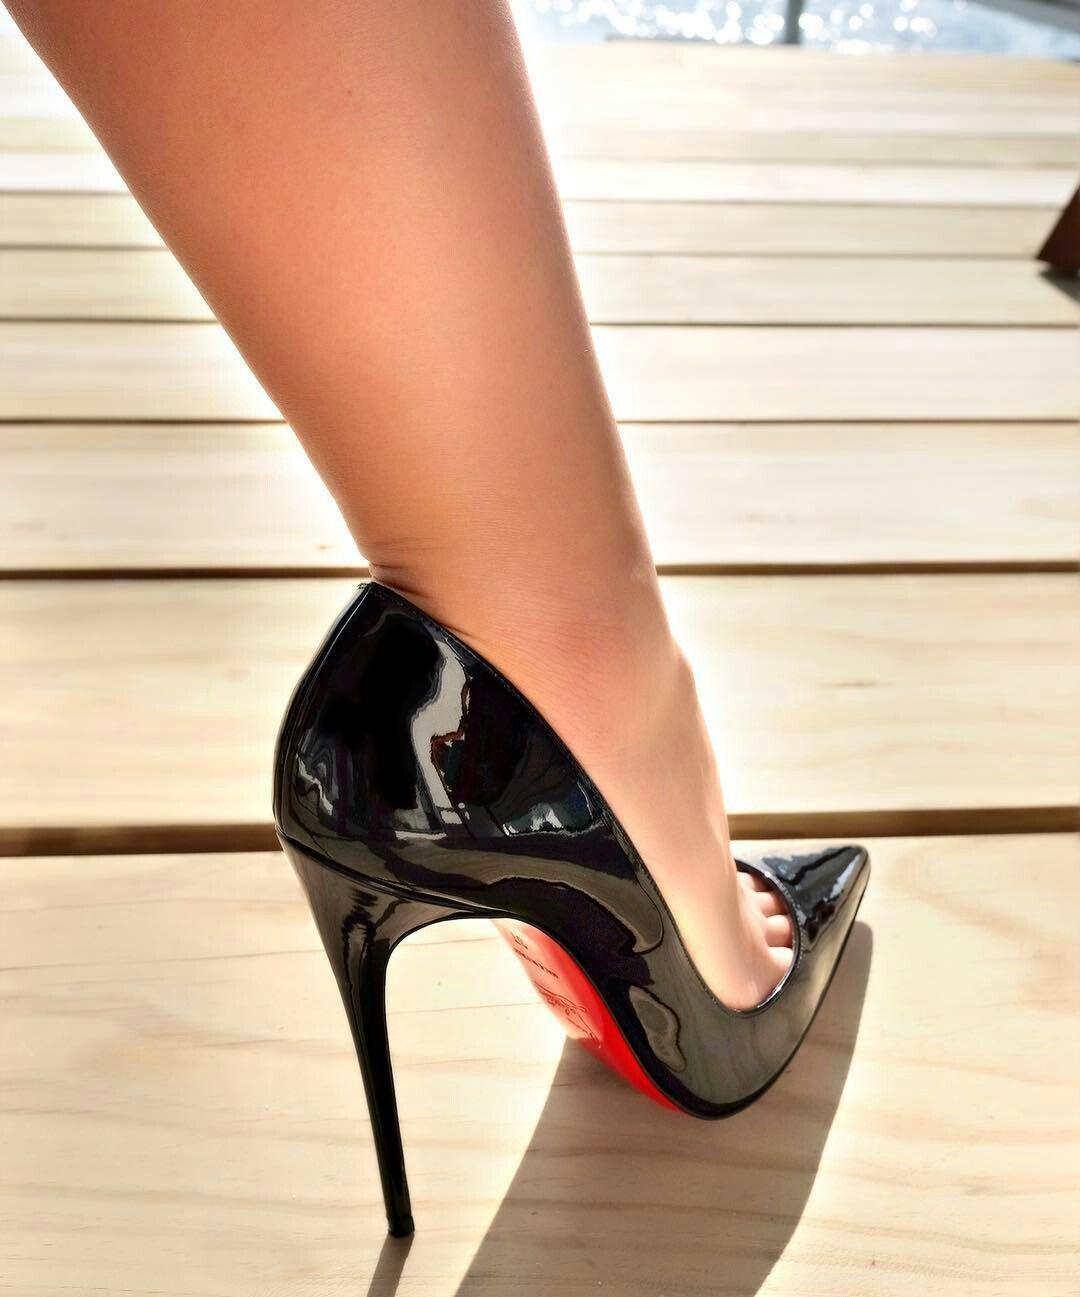 Ebony bitches high heel boots